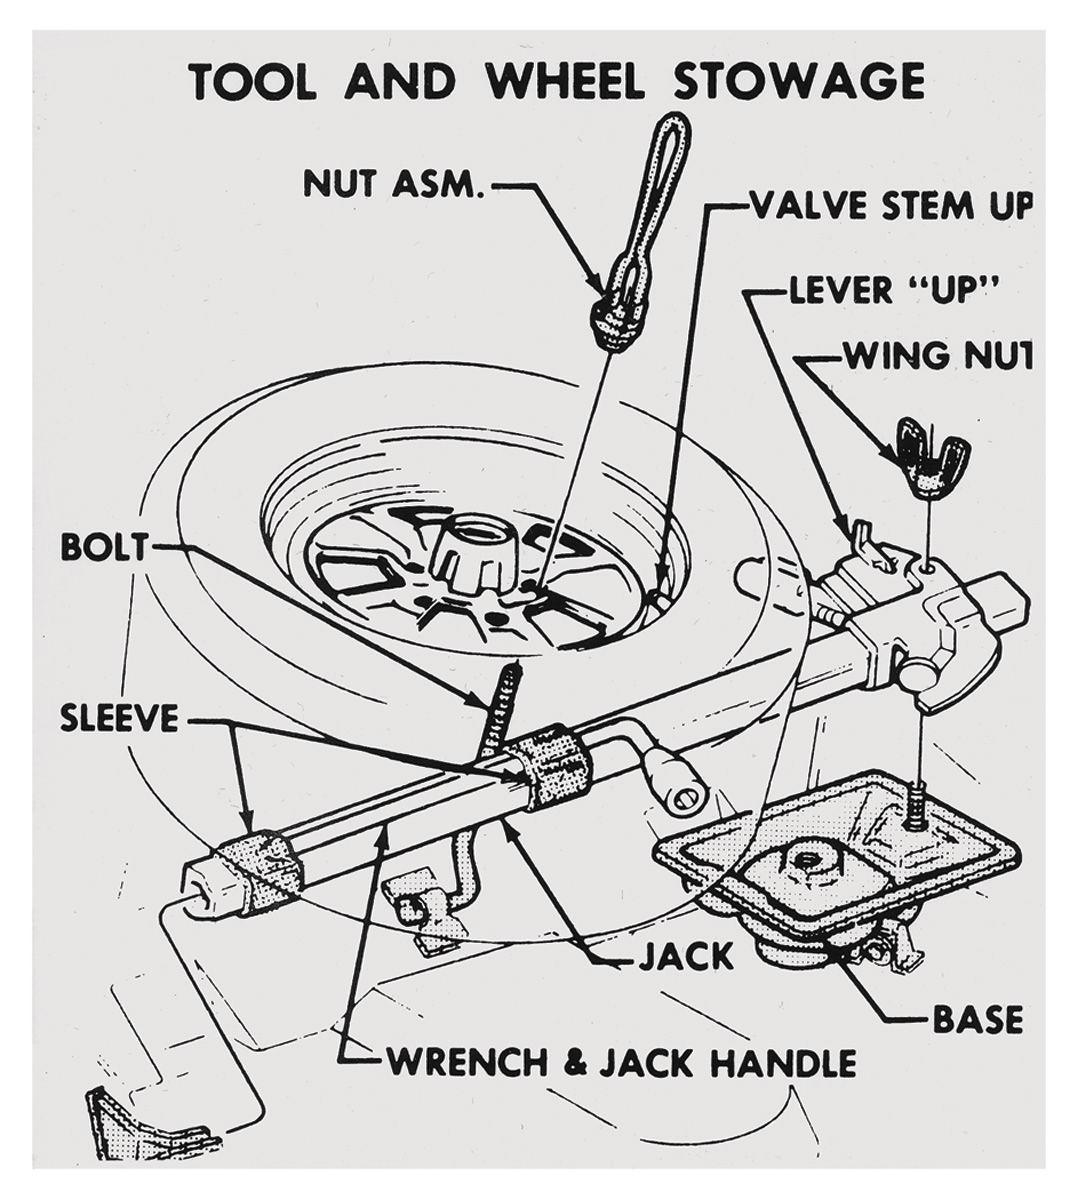 Decal, 1976-77 Cutlass, Tire Stowage Decal w/ Super Stock Wheels